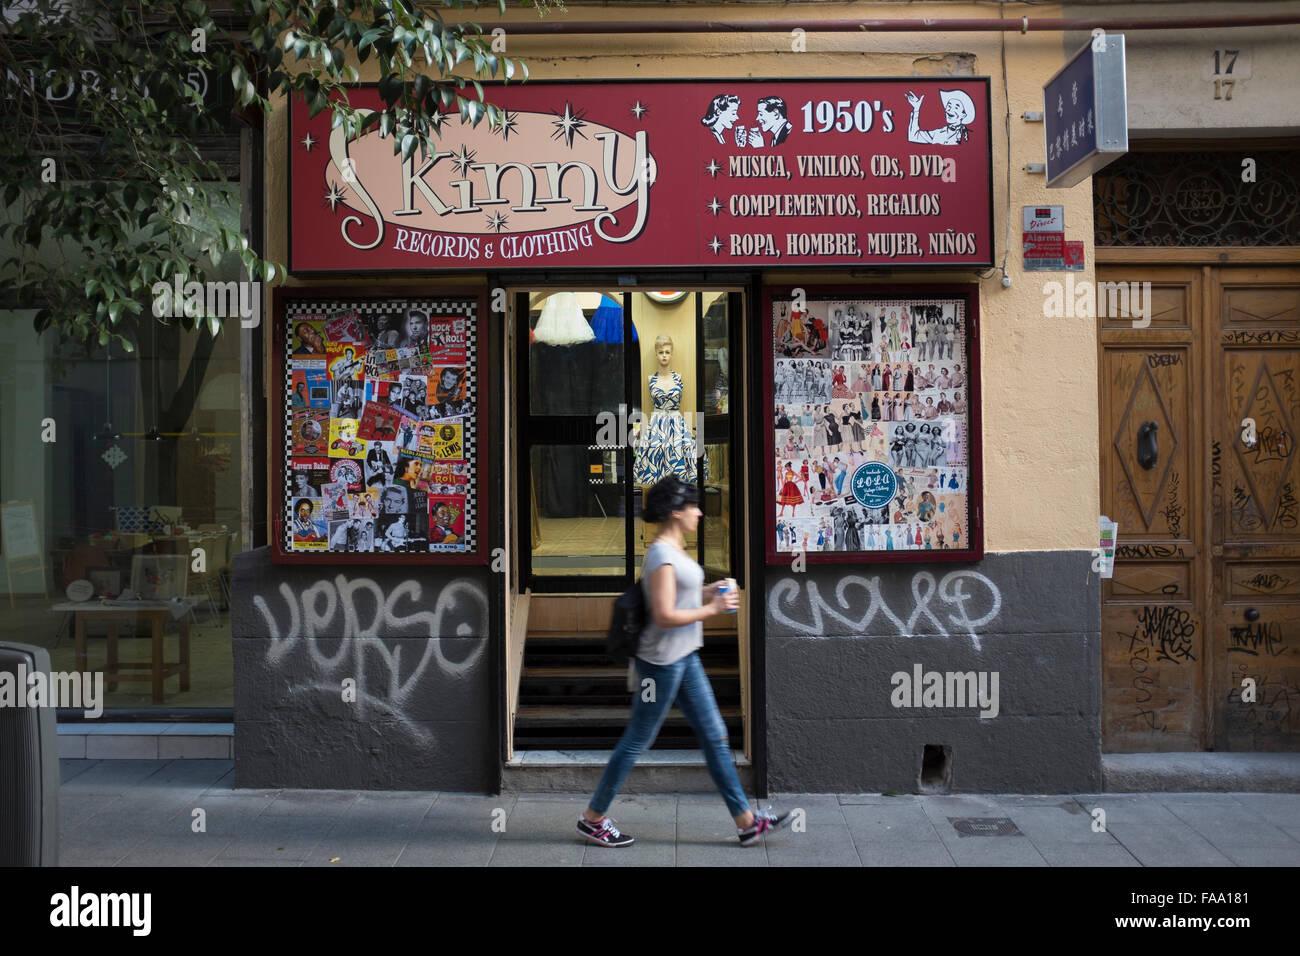 Retro Shop In Hastings Town Westhill Arcade George: Vintage Records Shop Stock Photos & Vintage Records Shop